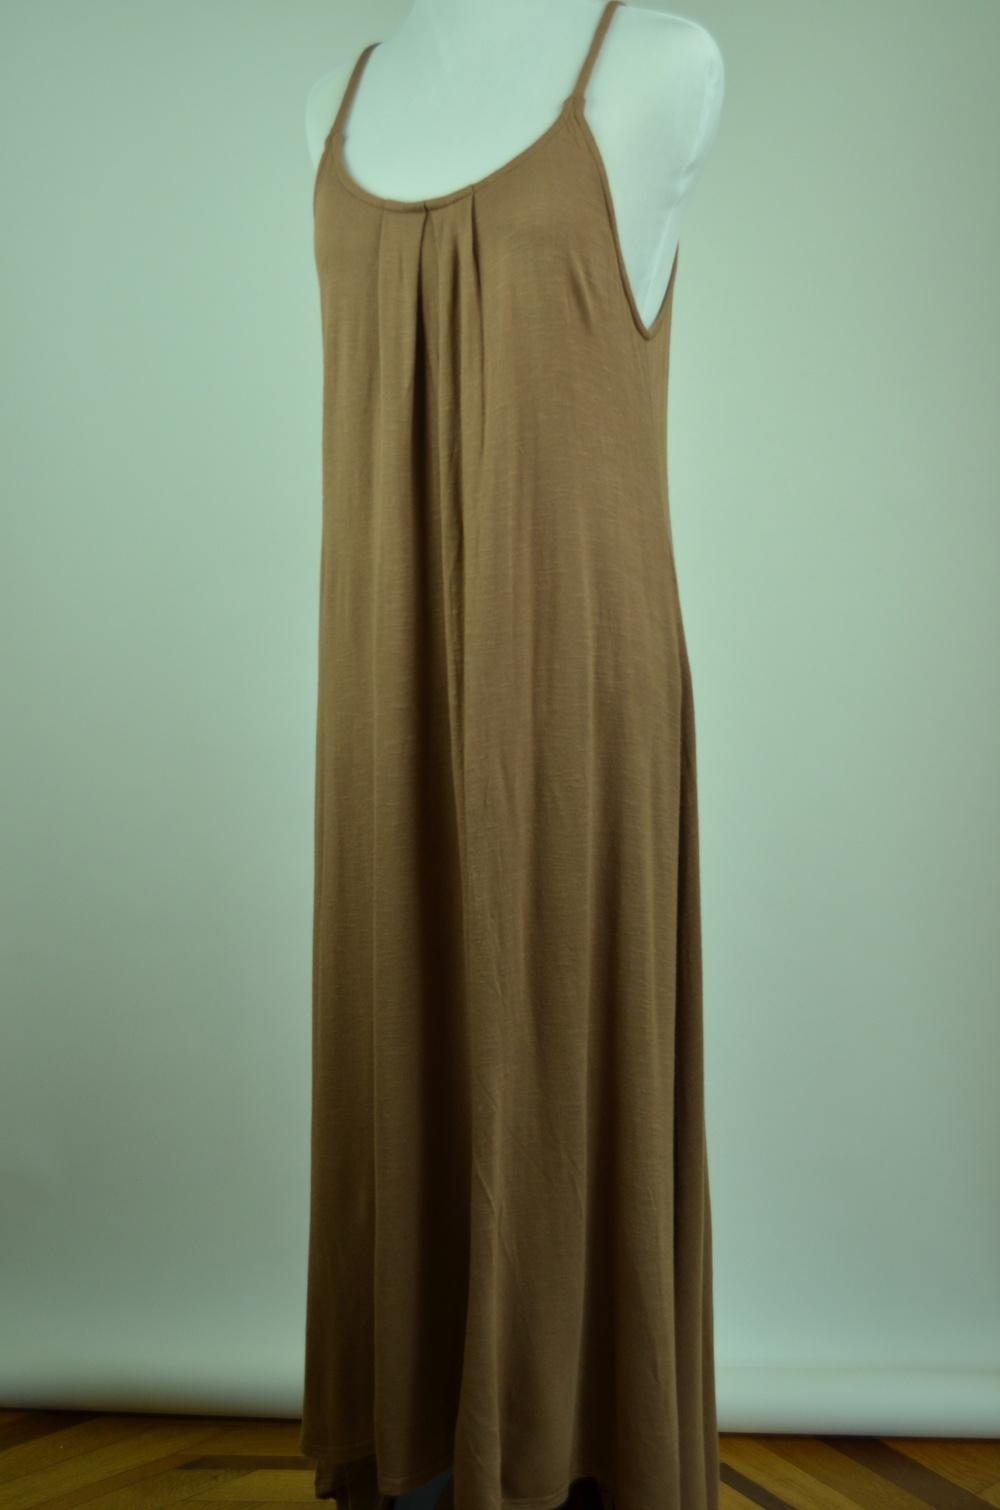 18. Knit Dress